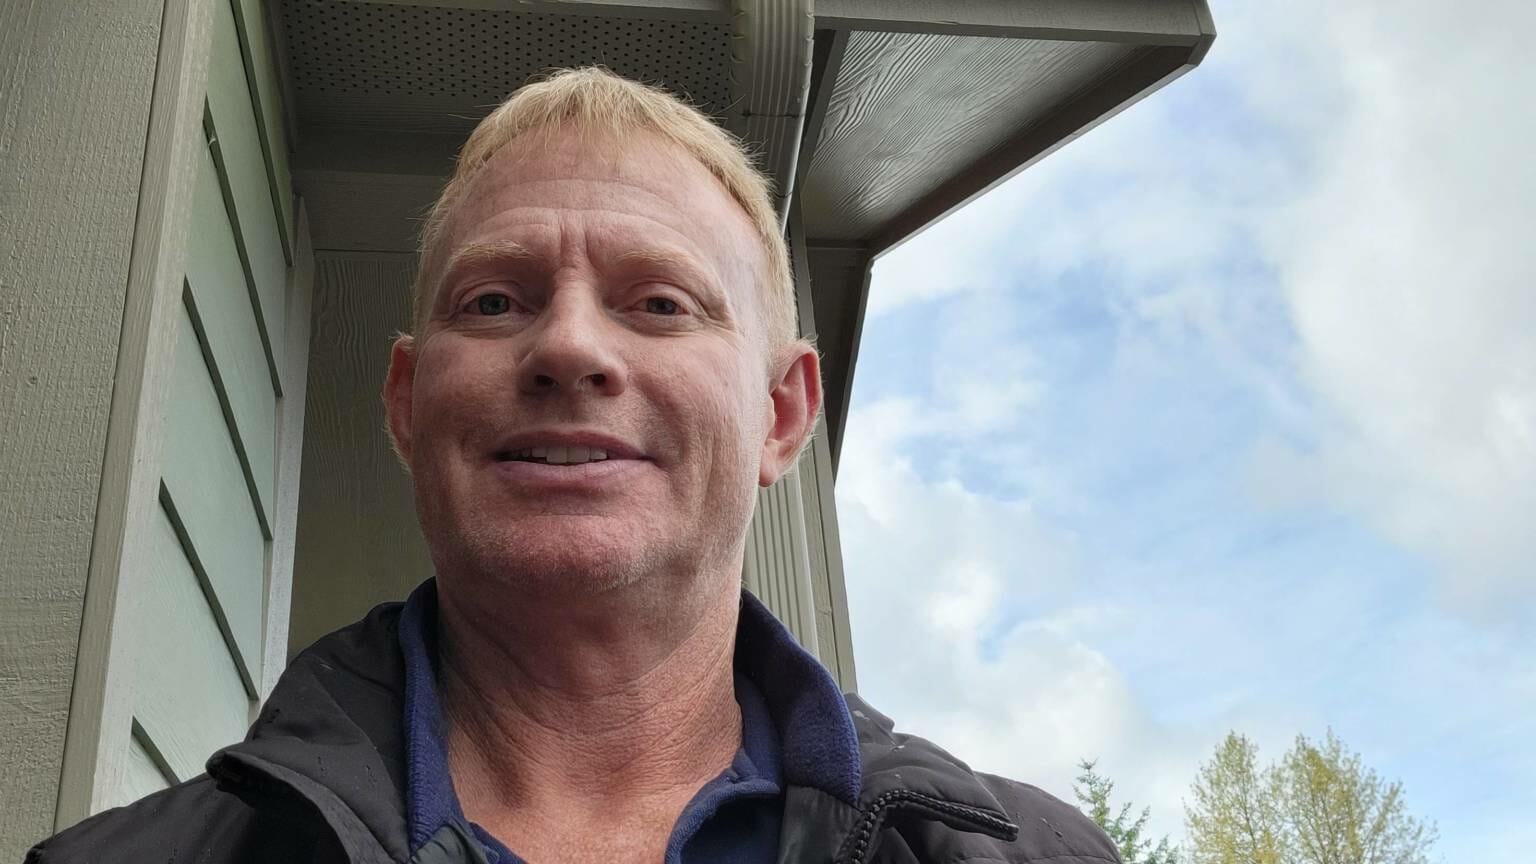 2021 09 15 Kevin Hamrick selfie aspect ratio 16 9 1536x864.